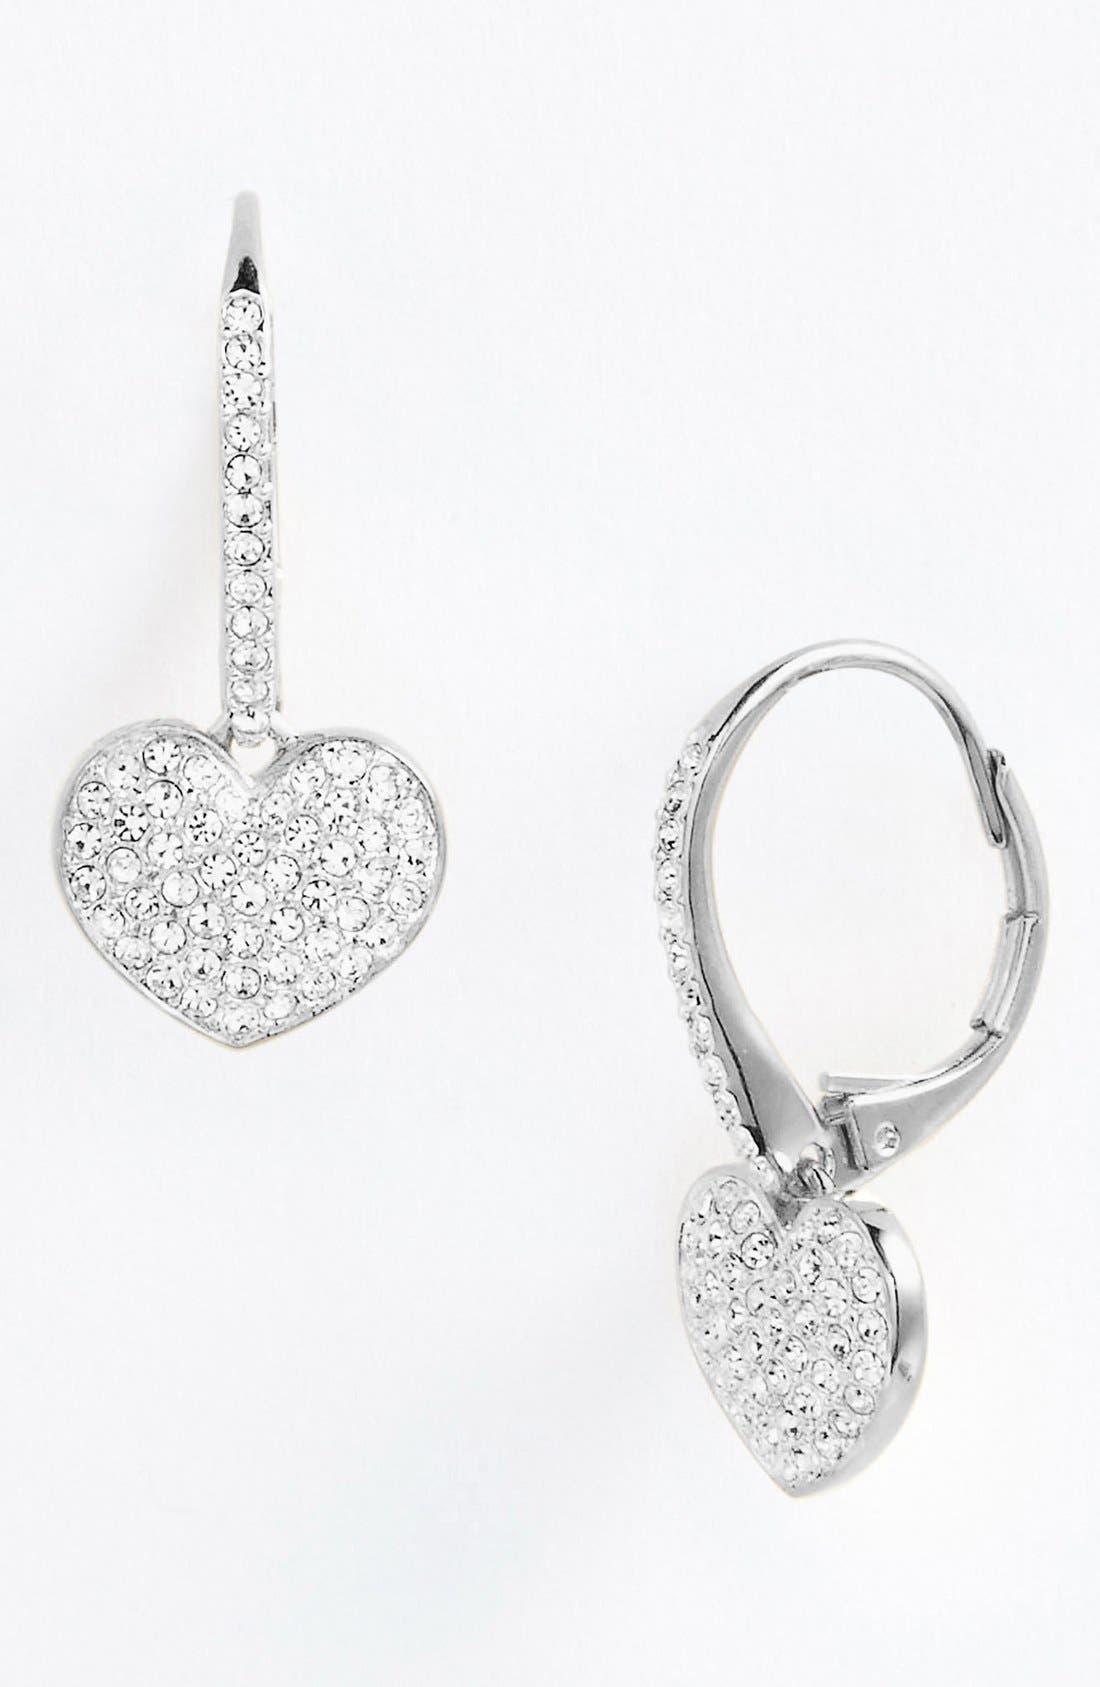 Alternate Image 1 Selected - Nadri 'Charmers' Pavé Symbol Drop Earrings (Nordstrom Exclusive)